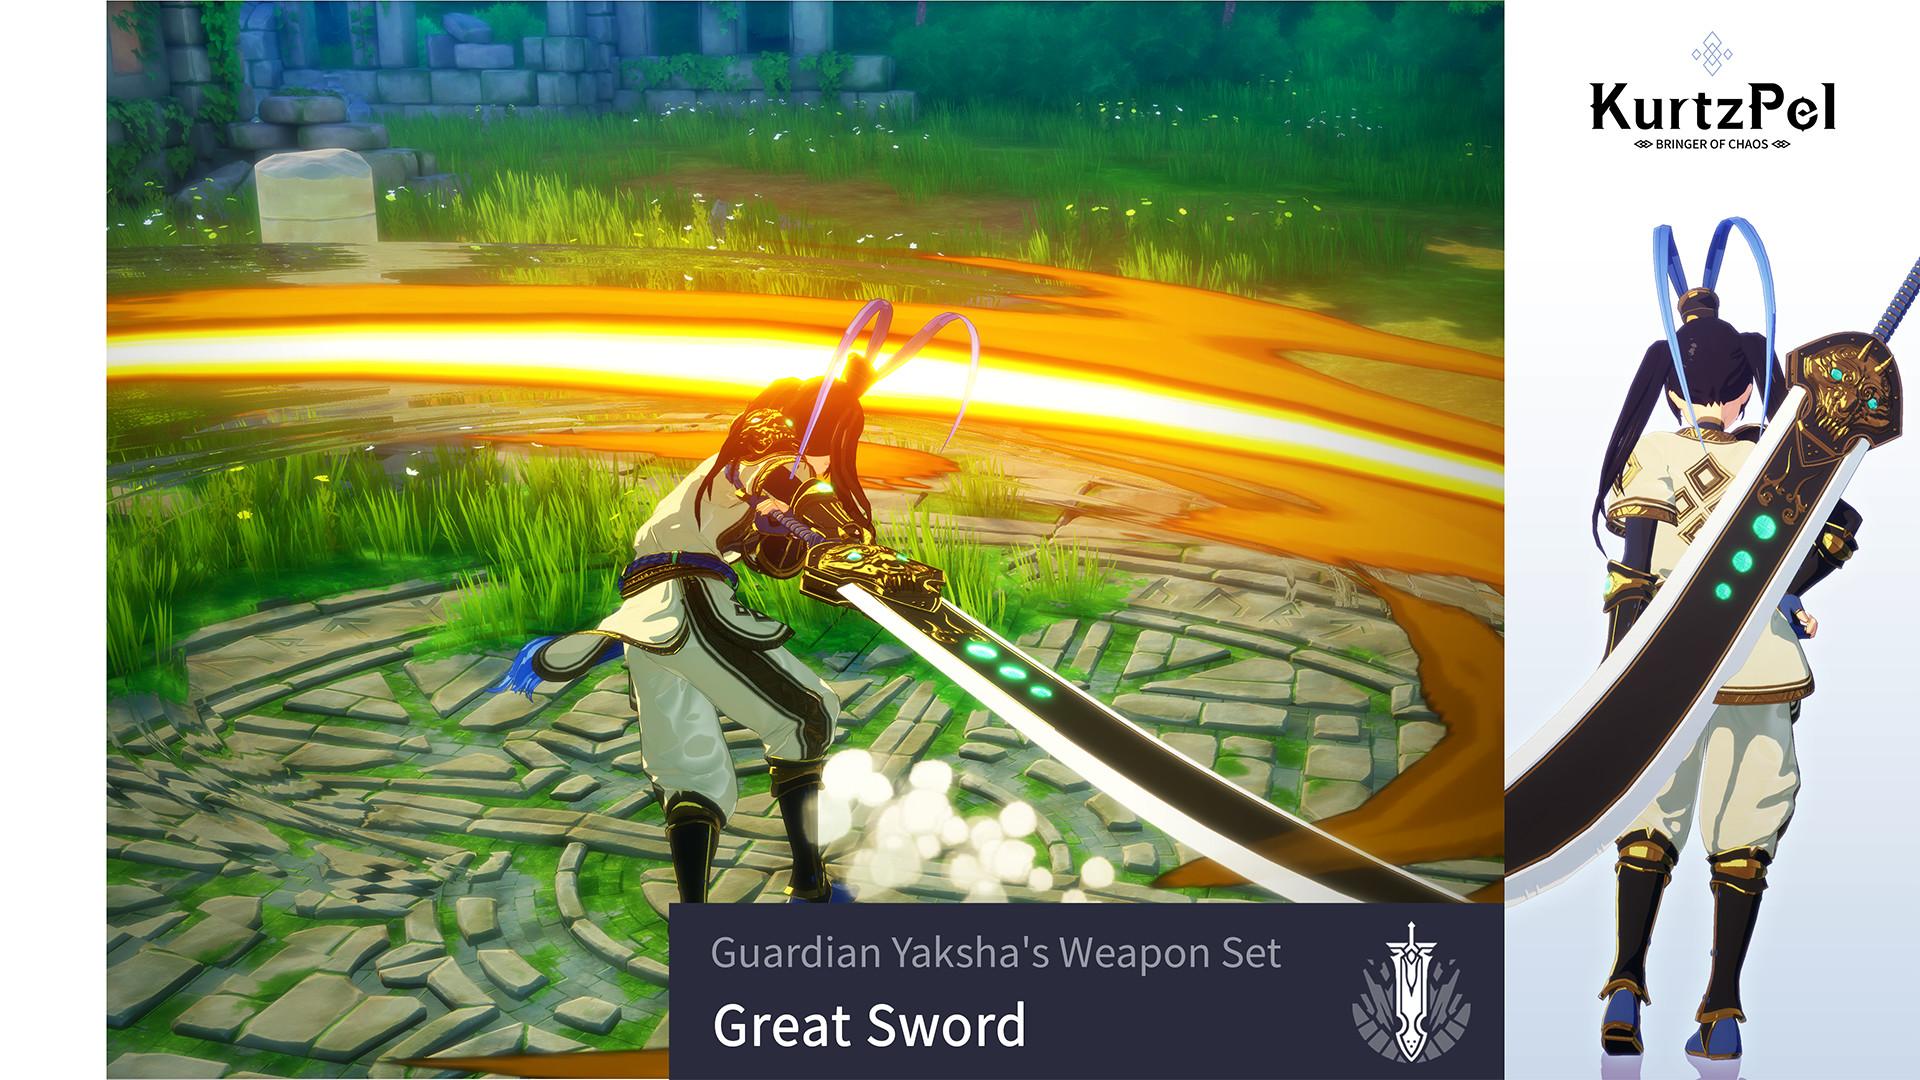 KHAiHOM.com - KurtzPel - Guardian Yaksha's Weapon Set